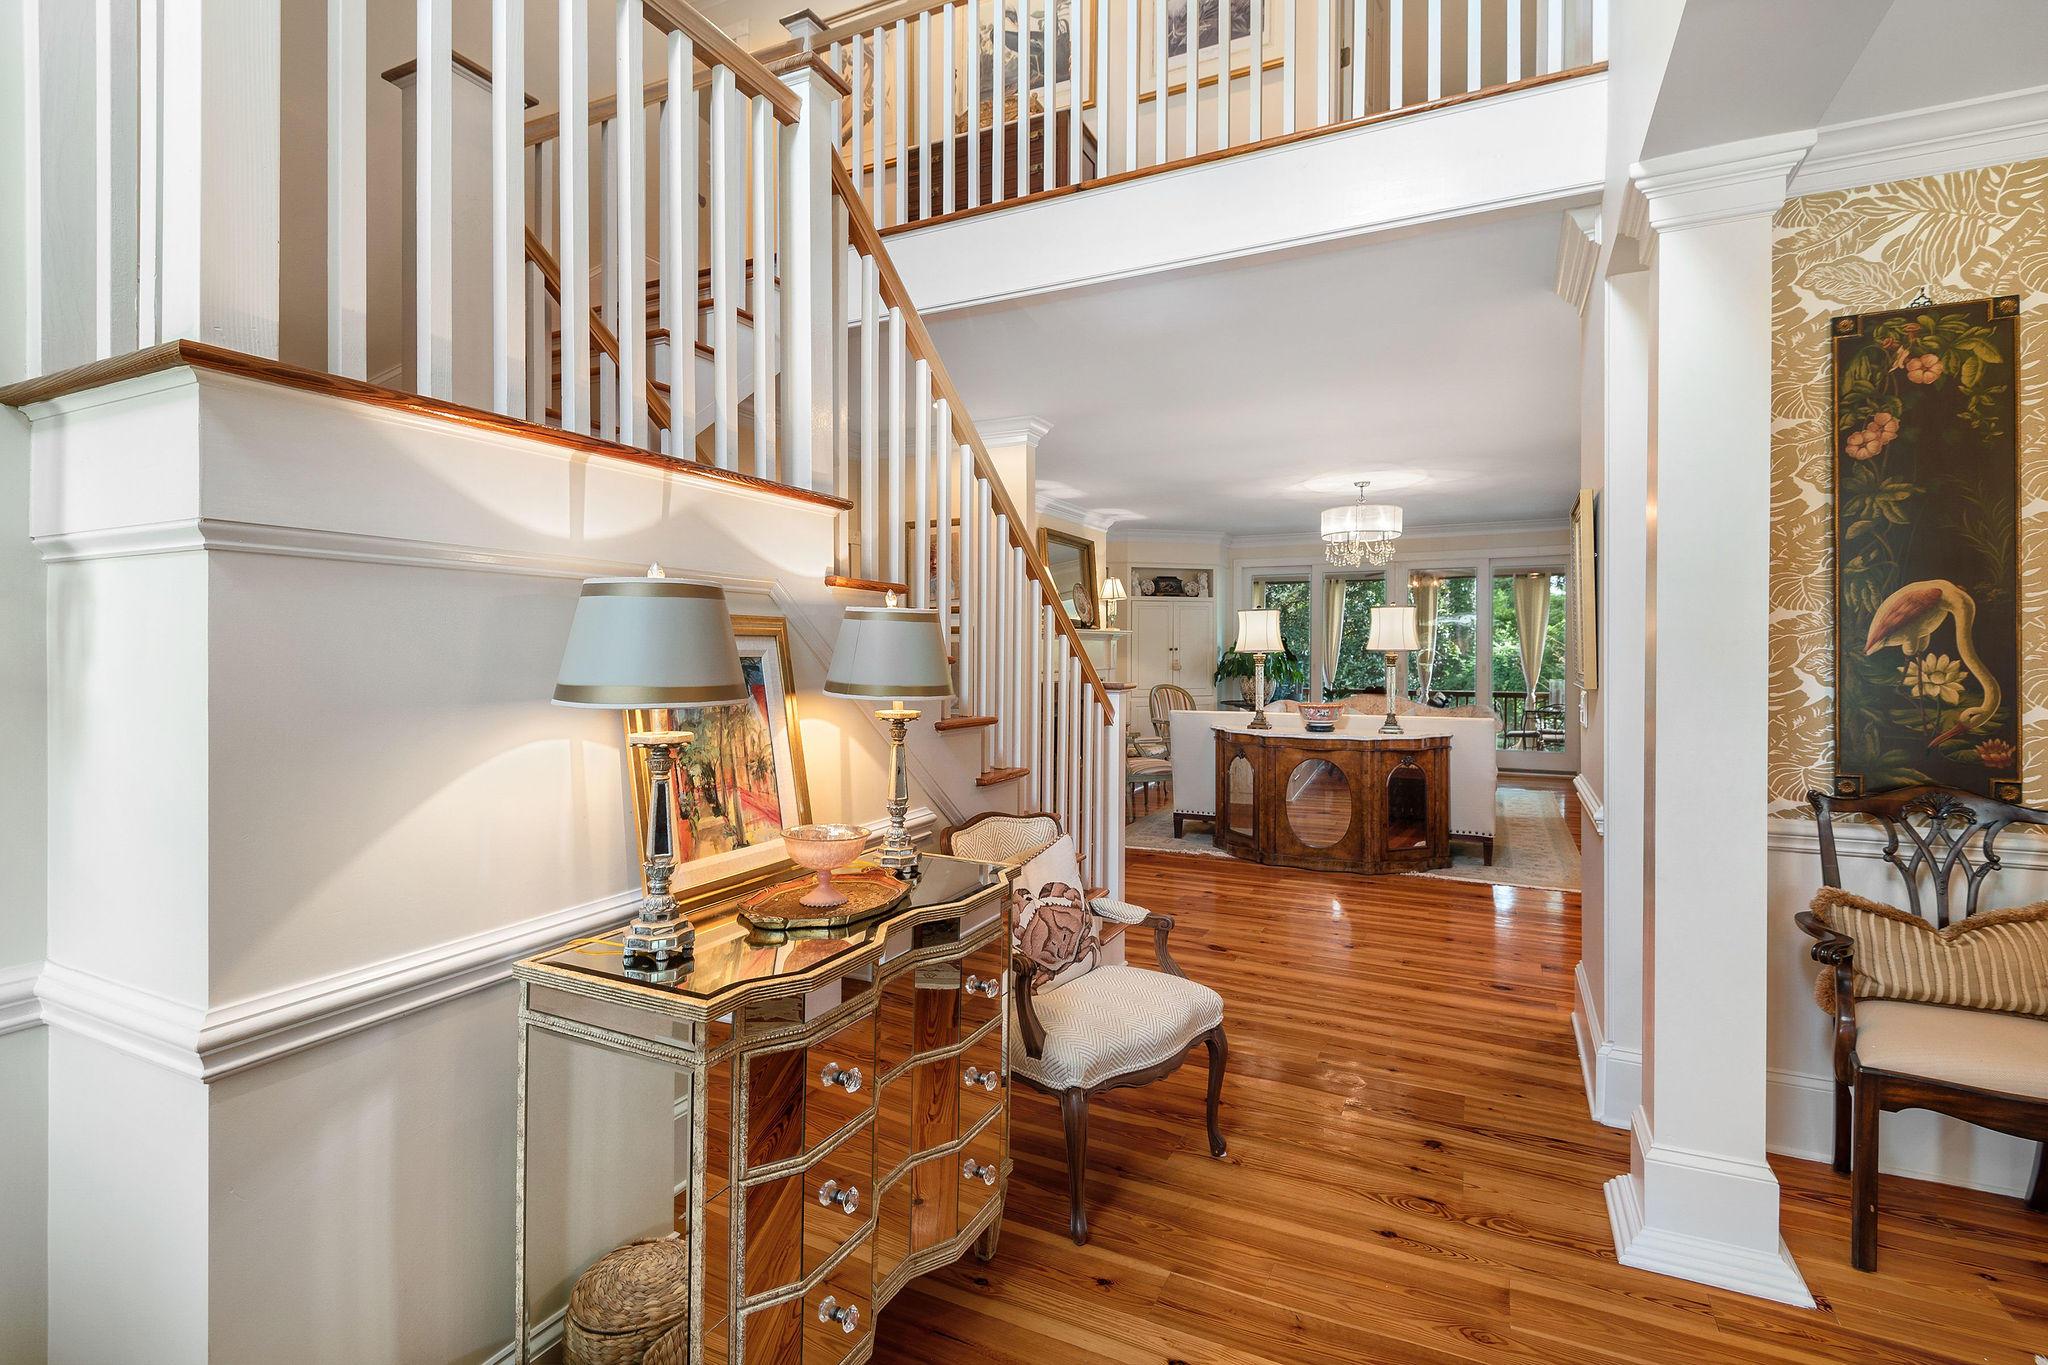 Country Club II Homes For Sale - 1482 Burningtree, Charleston, SC - 58